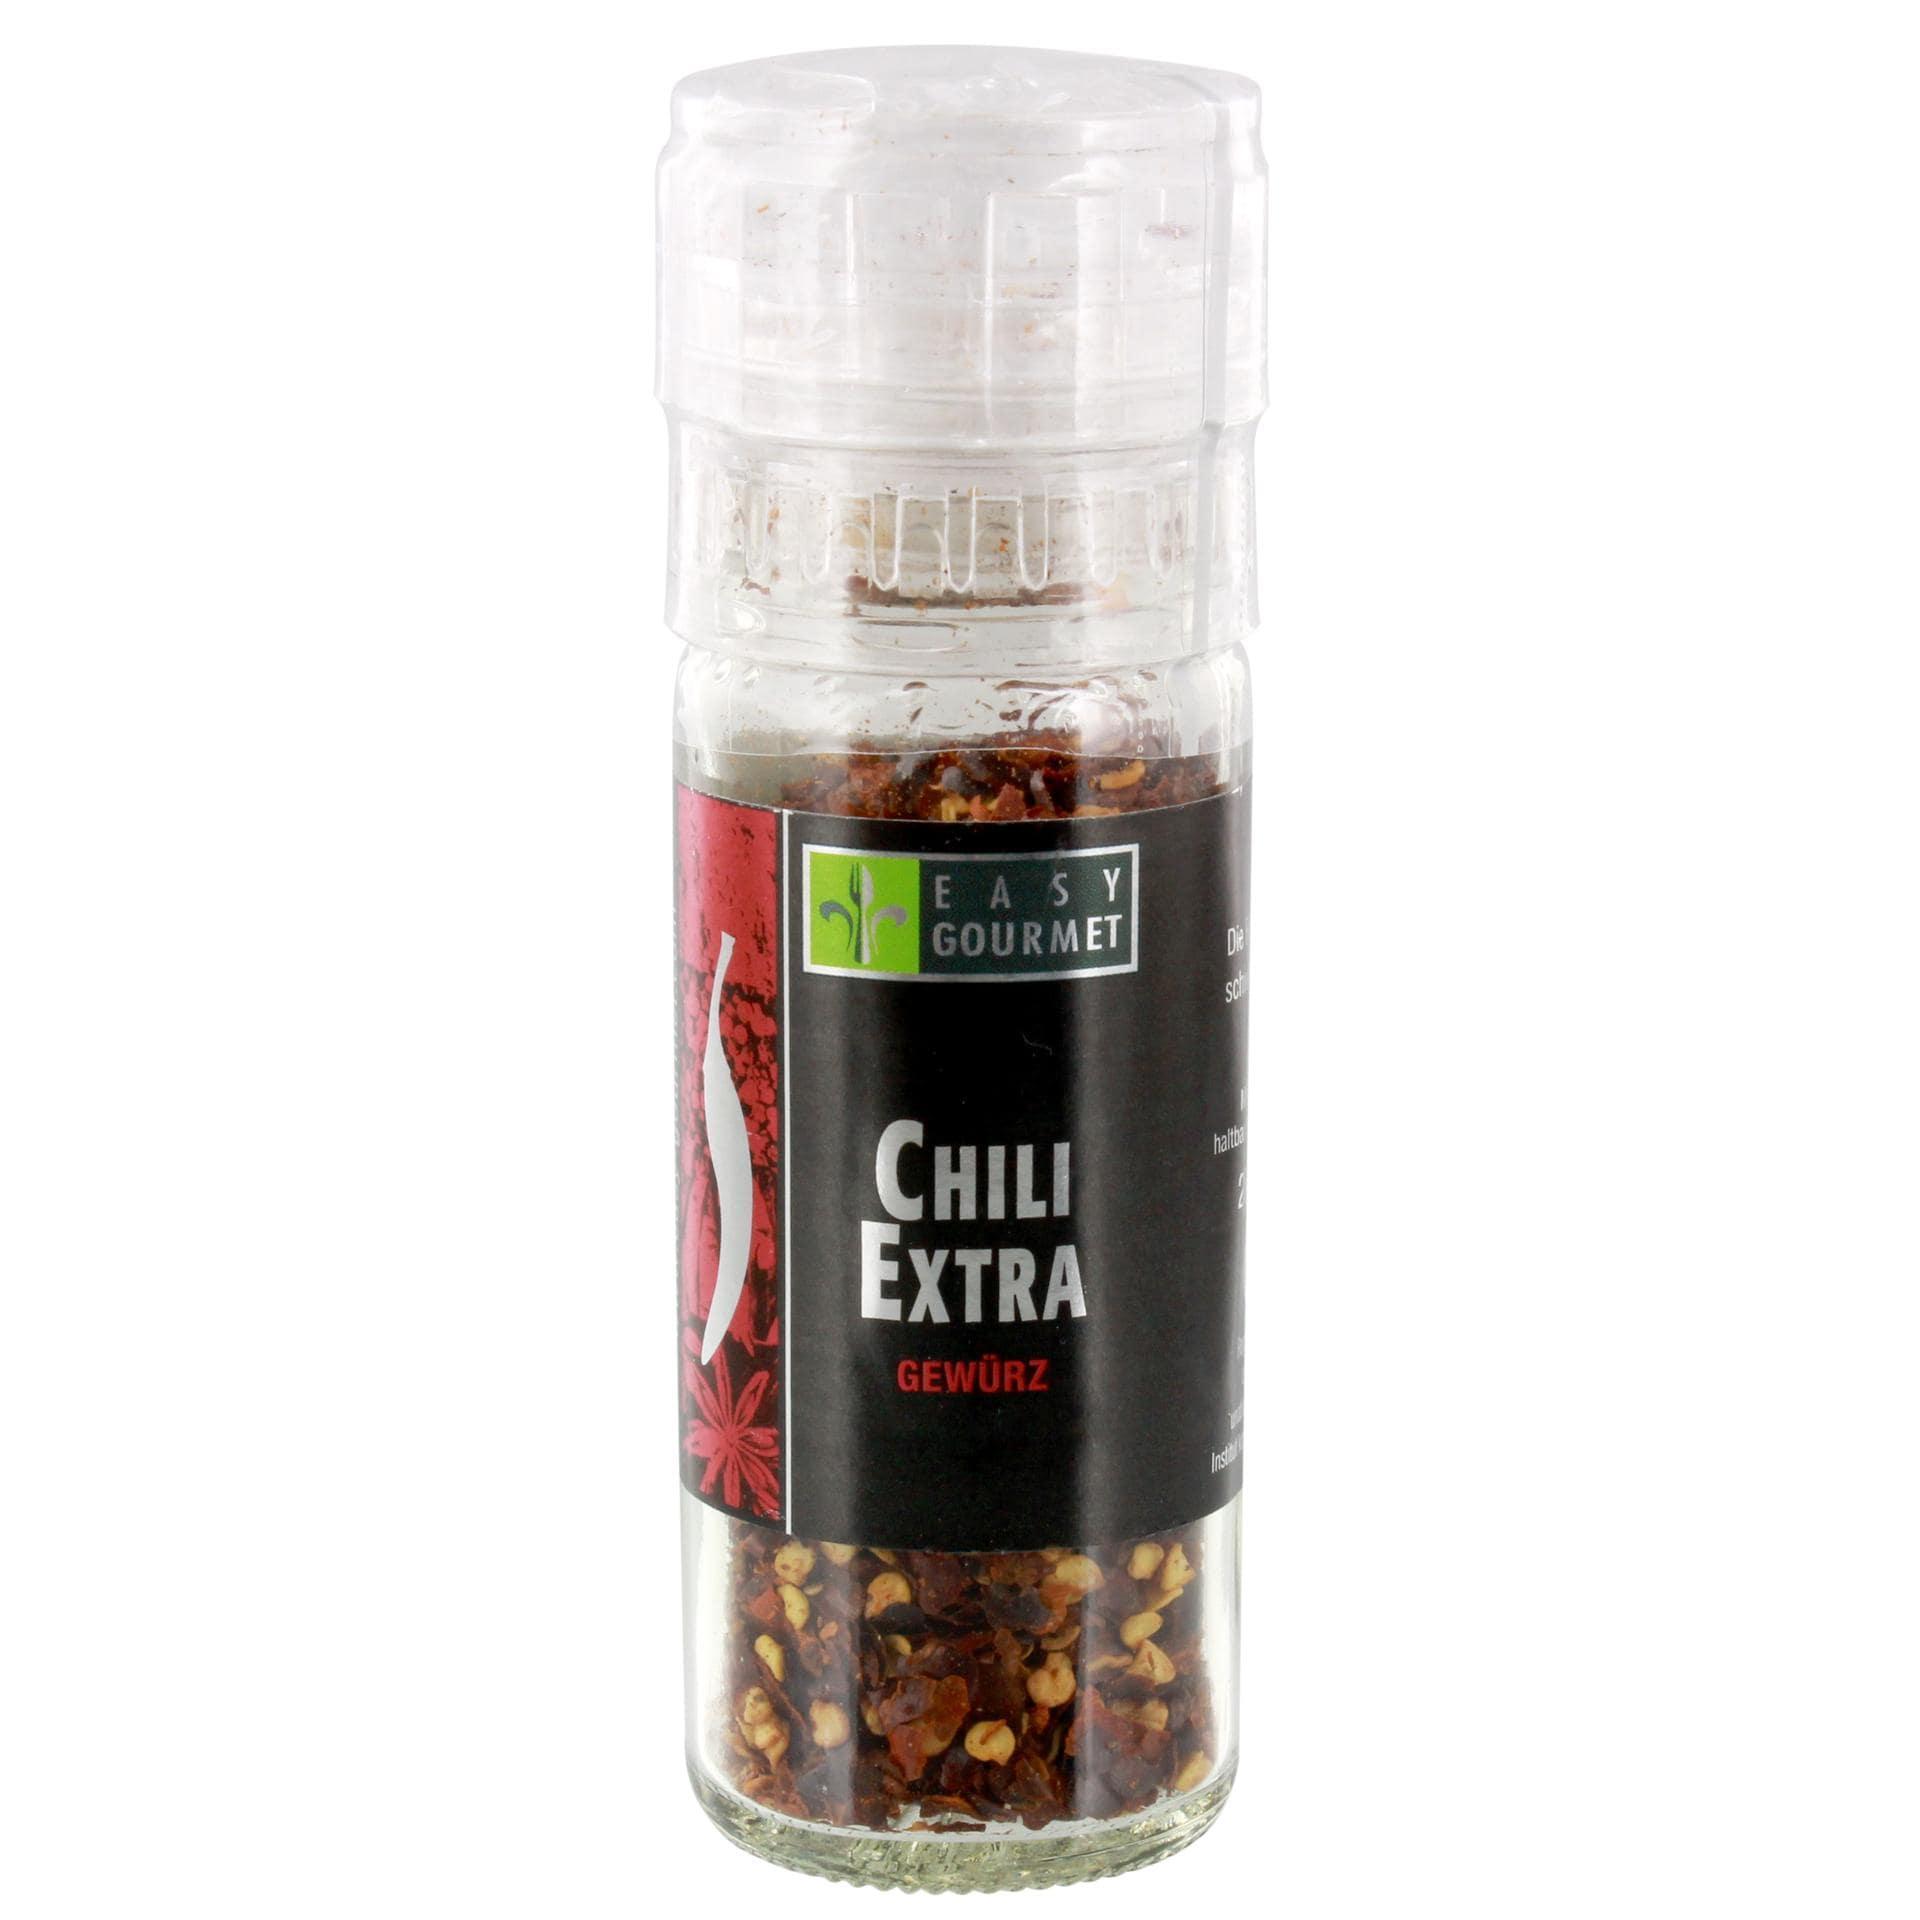 Easy Gourmet - Chili extra scharf Mühle Gewürz - 25g